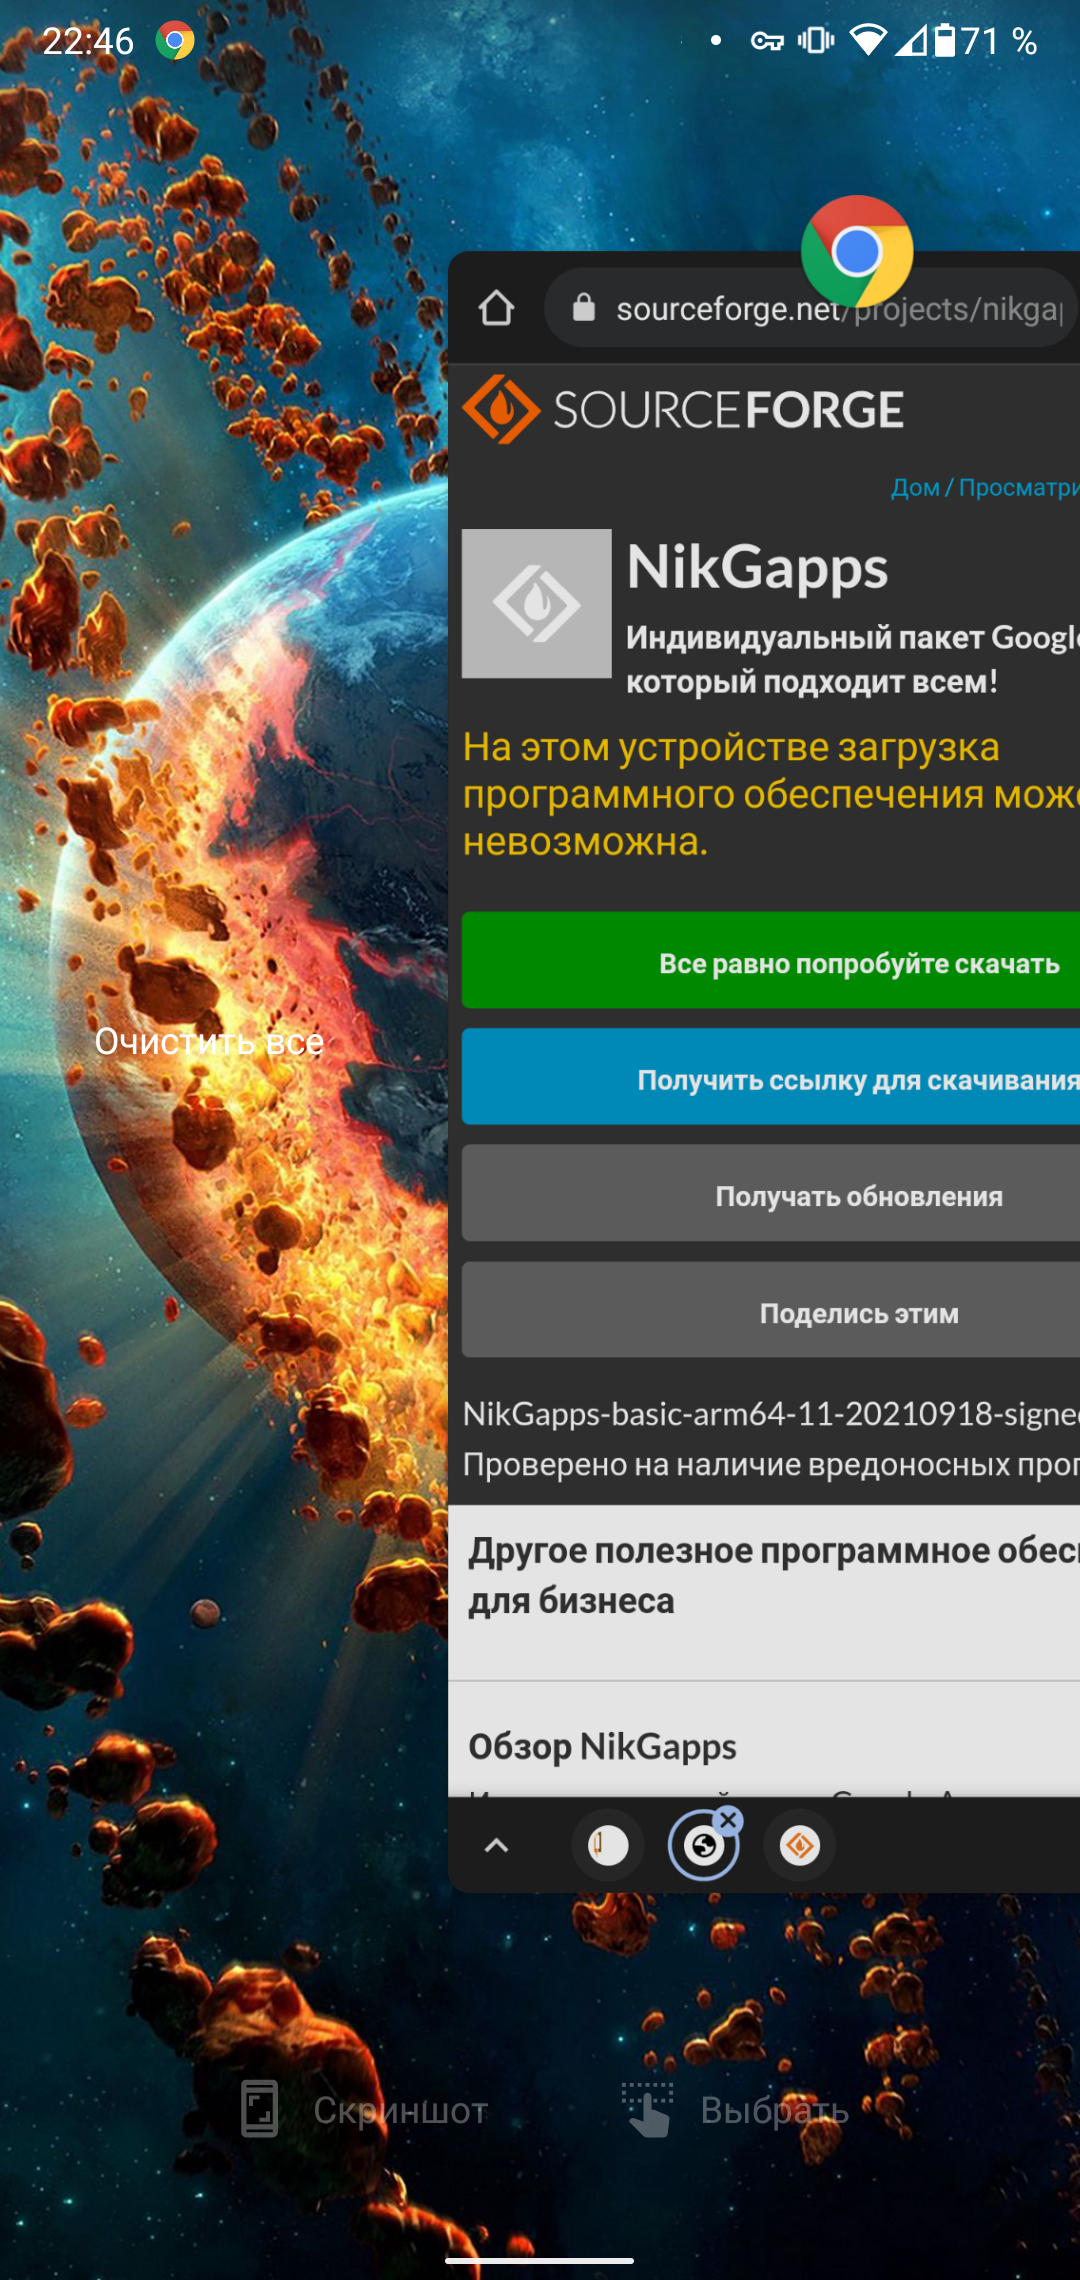 Screenshot_20211006-224640.png